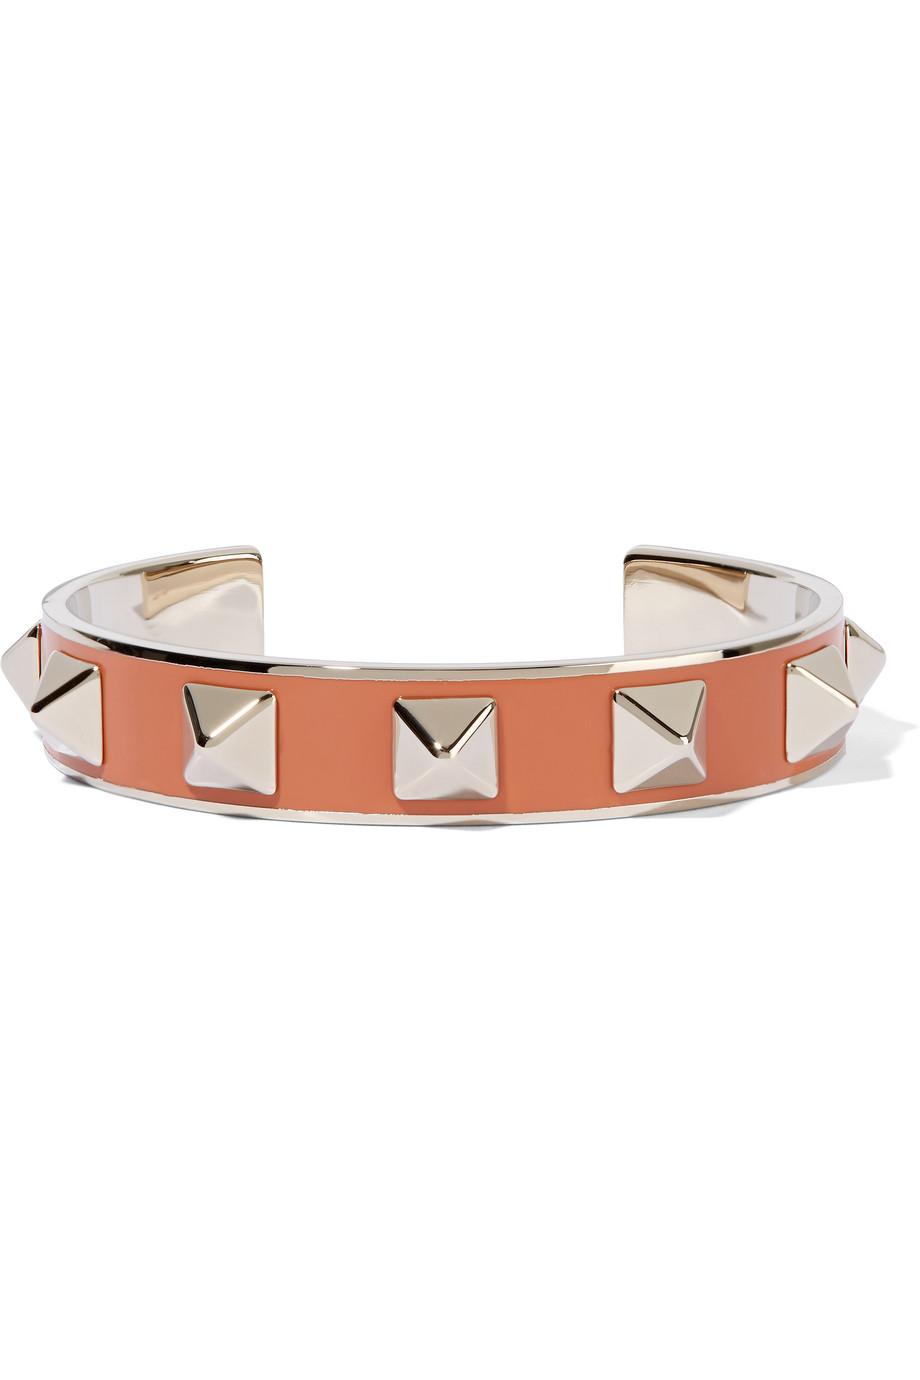 Valentino The Rockstud Pale Gold-Tone Enameled Cuff, Orange, Women's